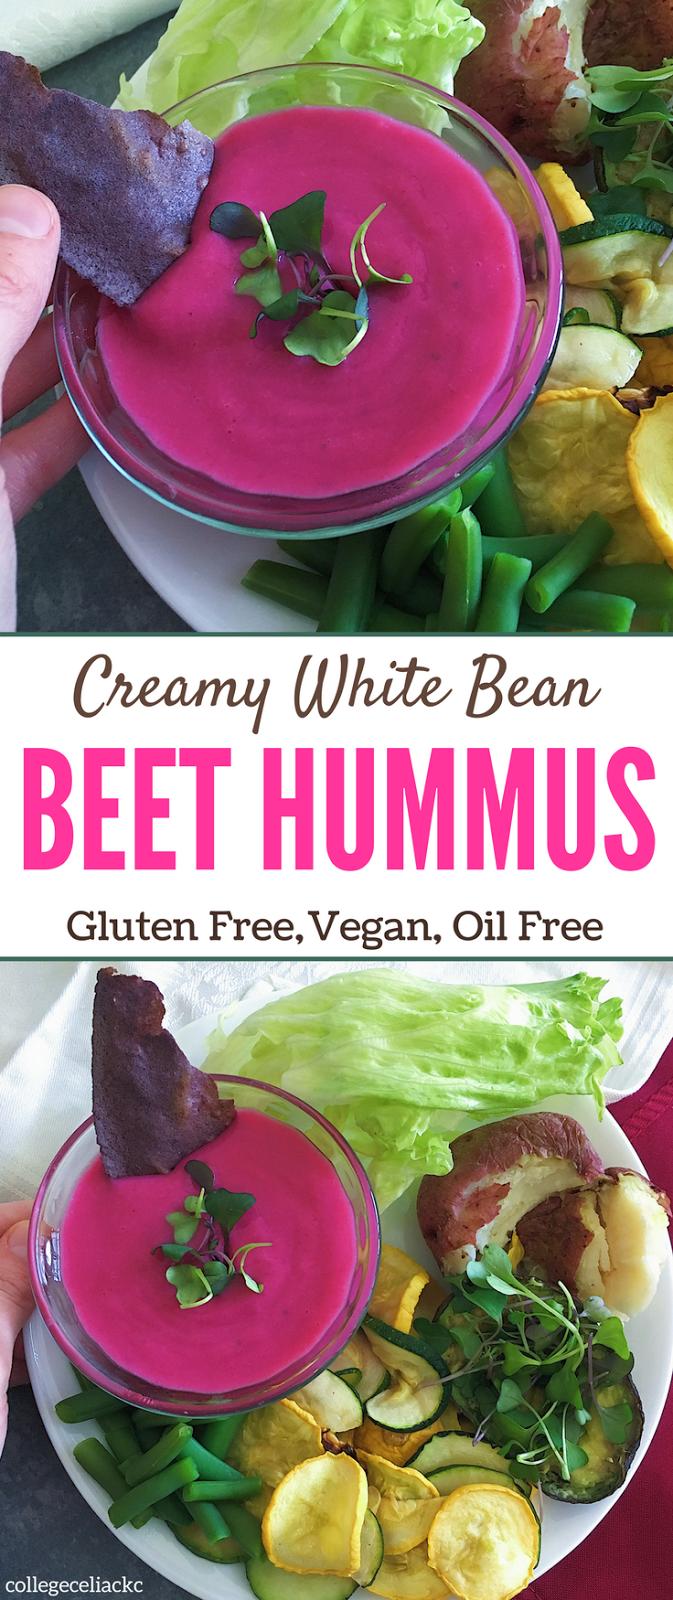 Creamy White Bean Beet Vegan Hummus Recipe (Gluten Free, Vegan, Oil Free)